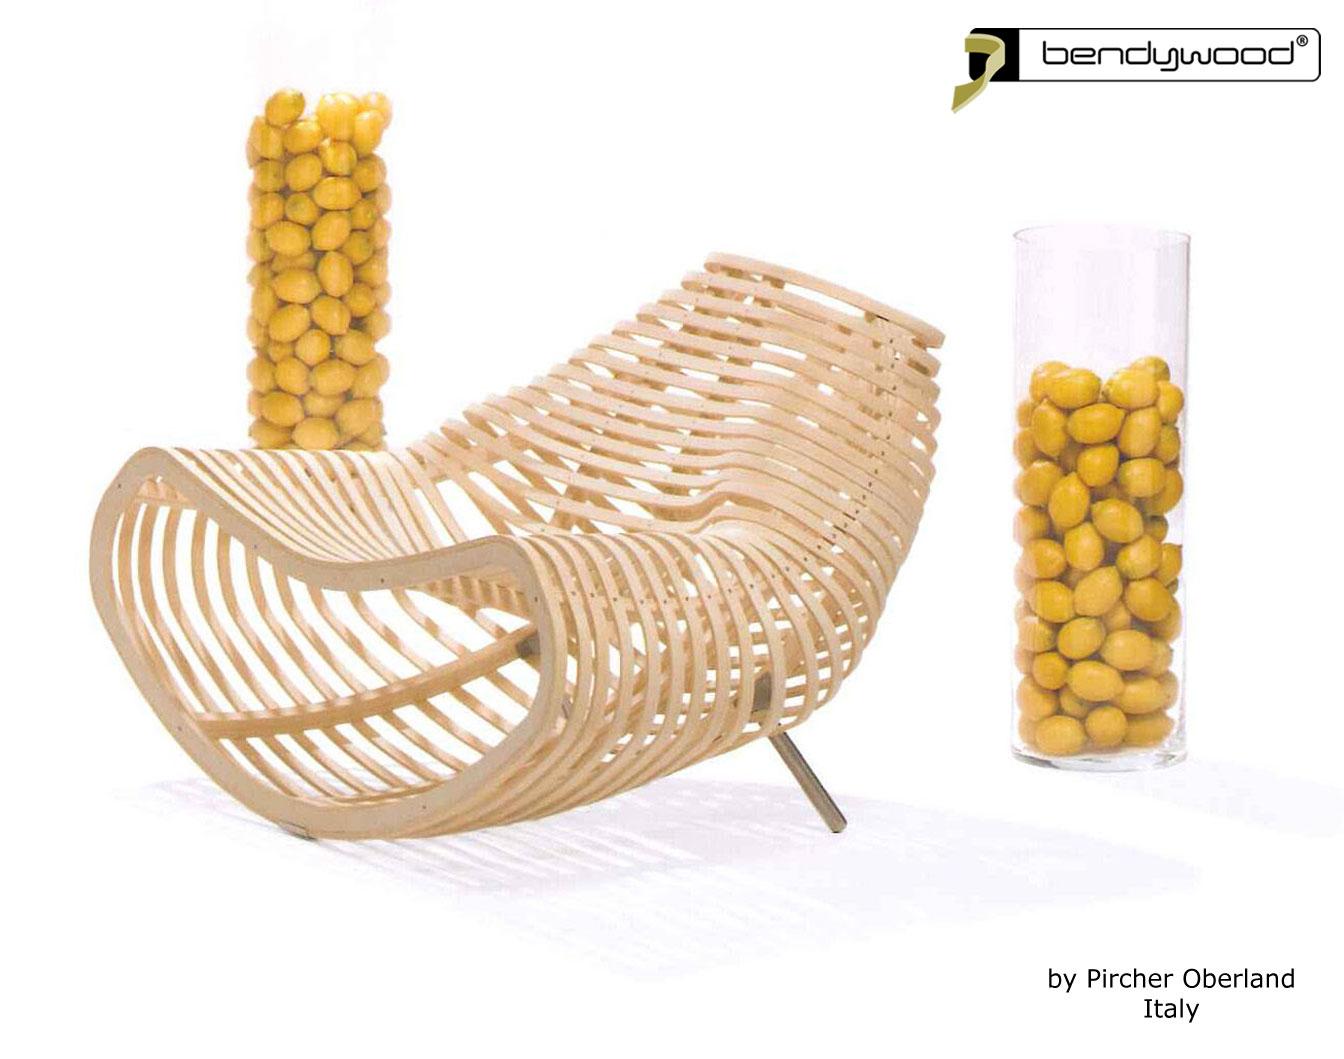 Bending wood Bendywood® - seating furniture